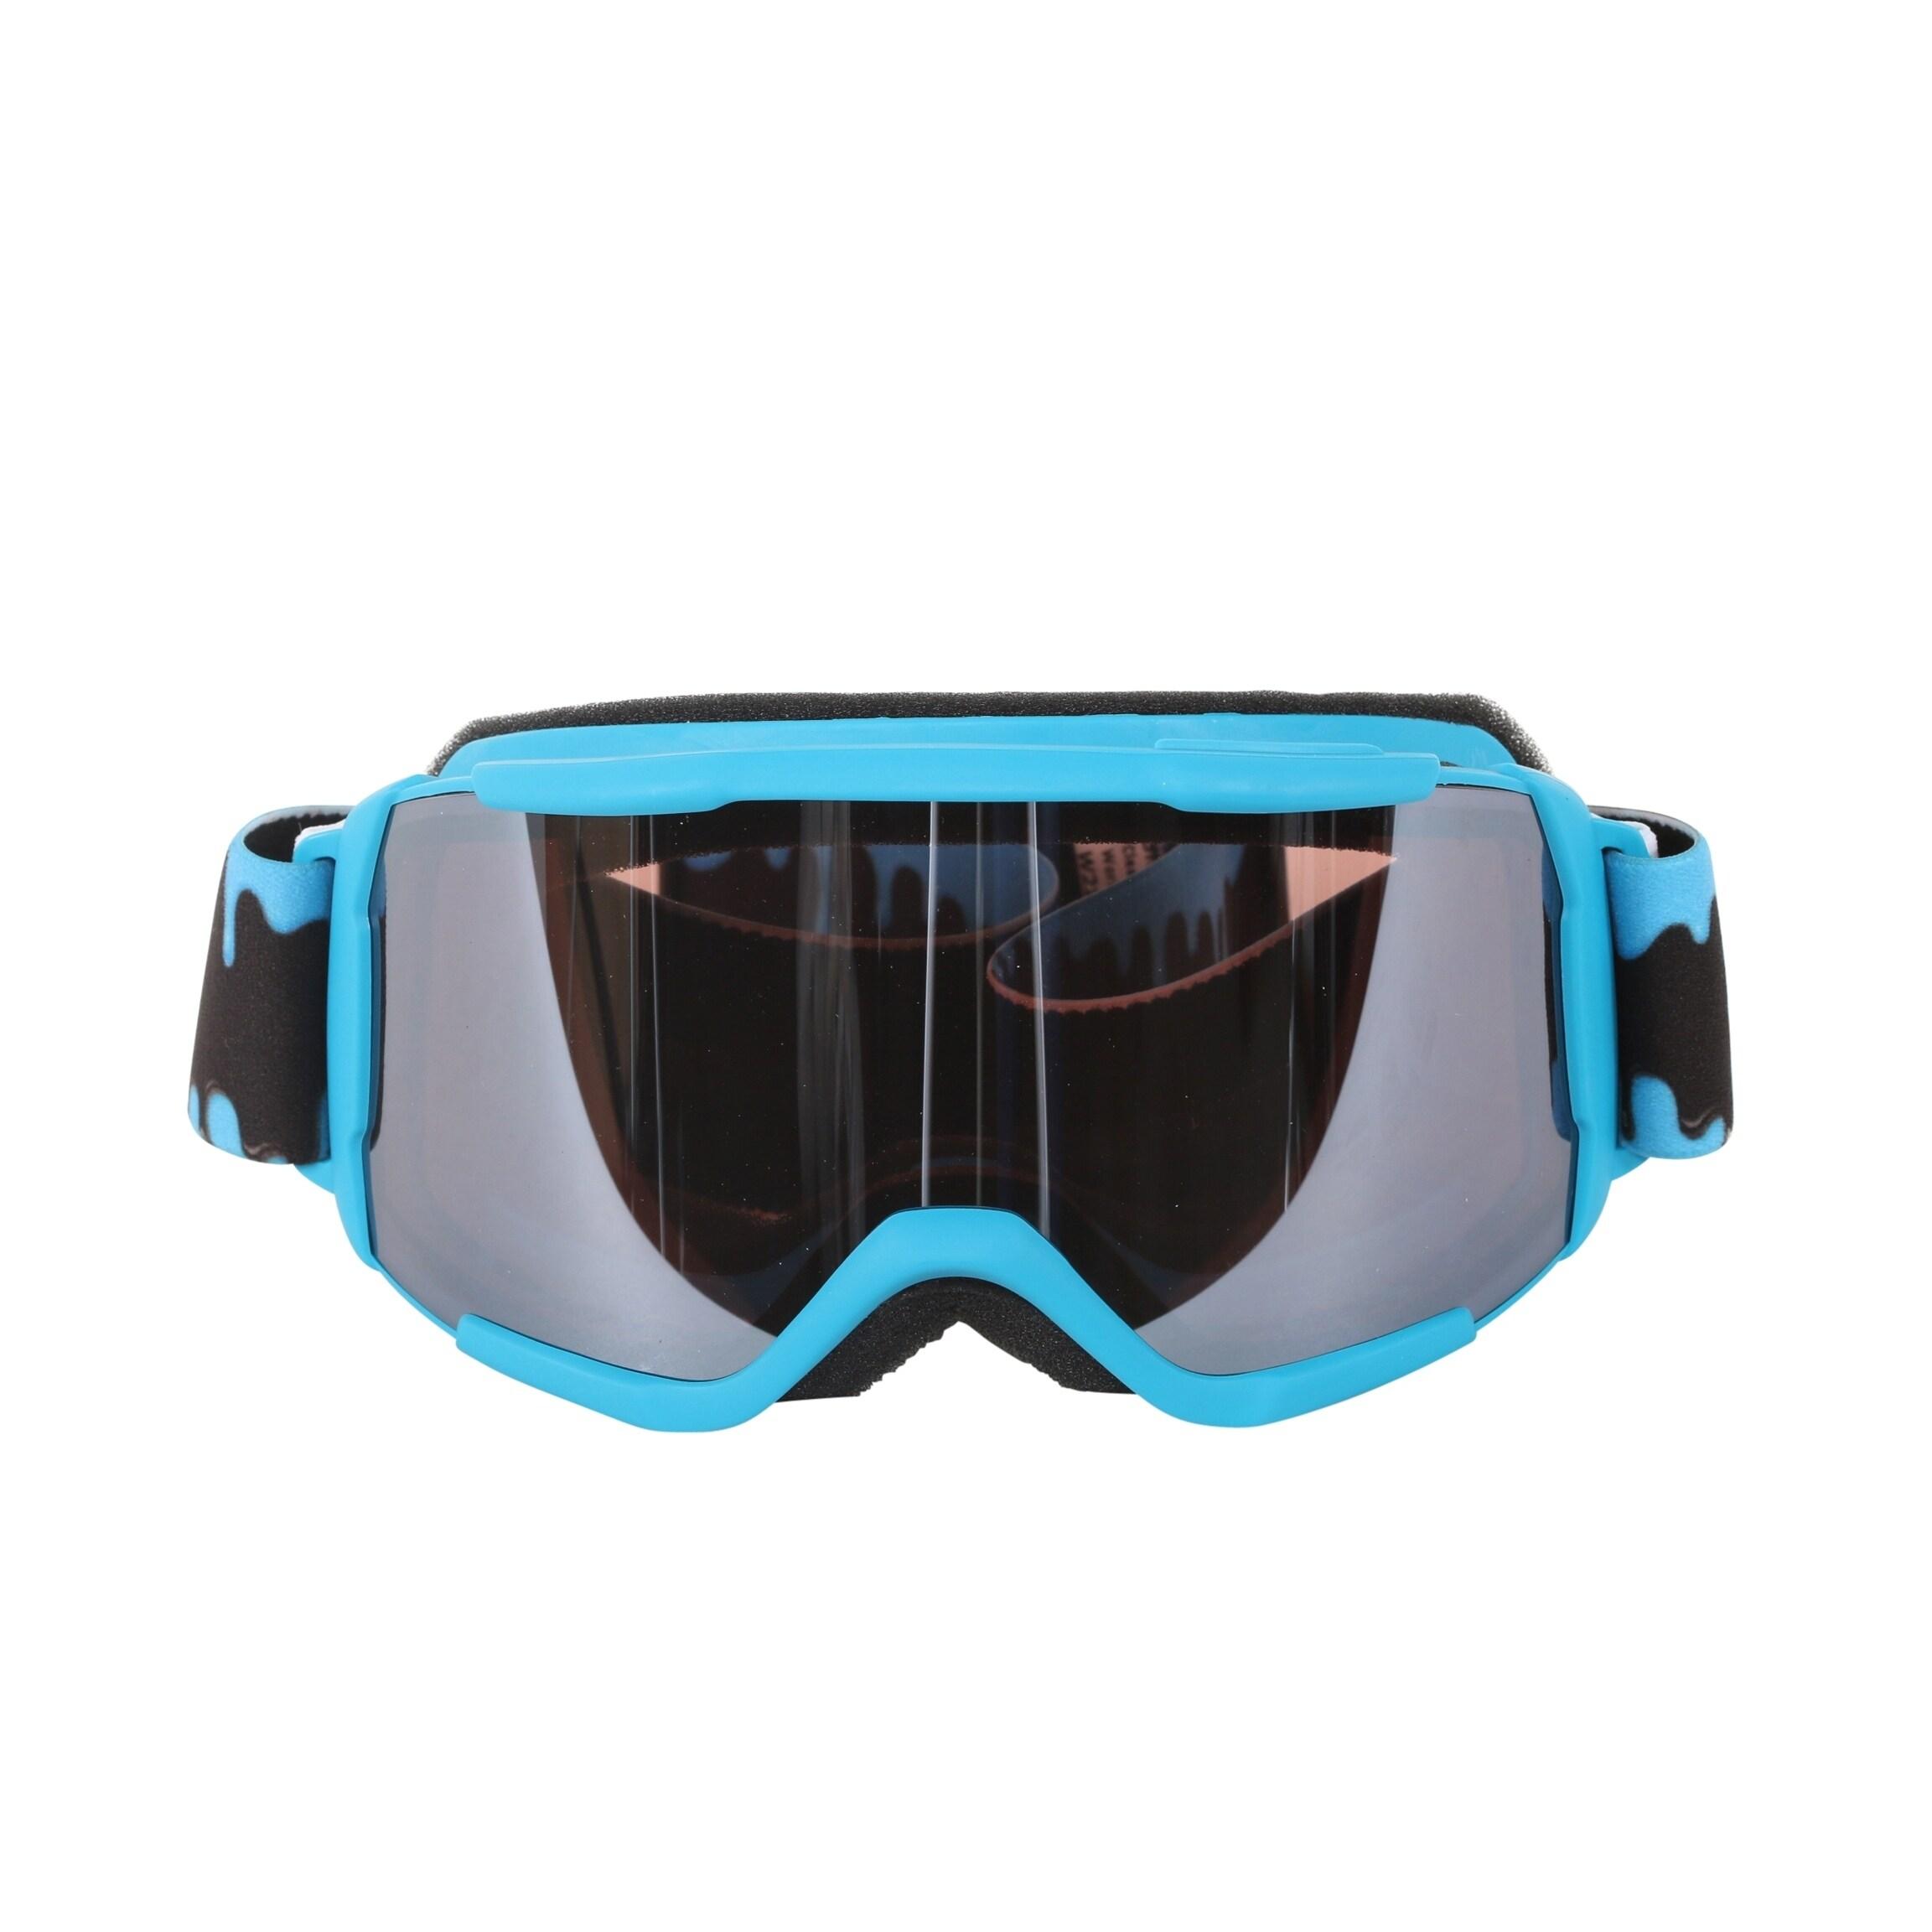 Smith Optics Cyan (Blue) Slime Daredevil Youth Medium Fit...